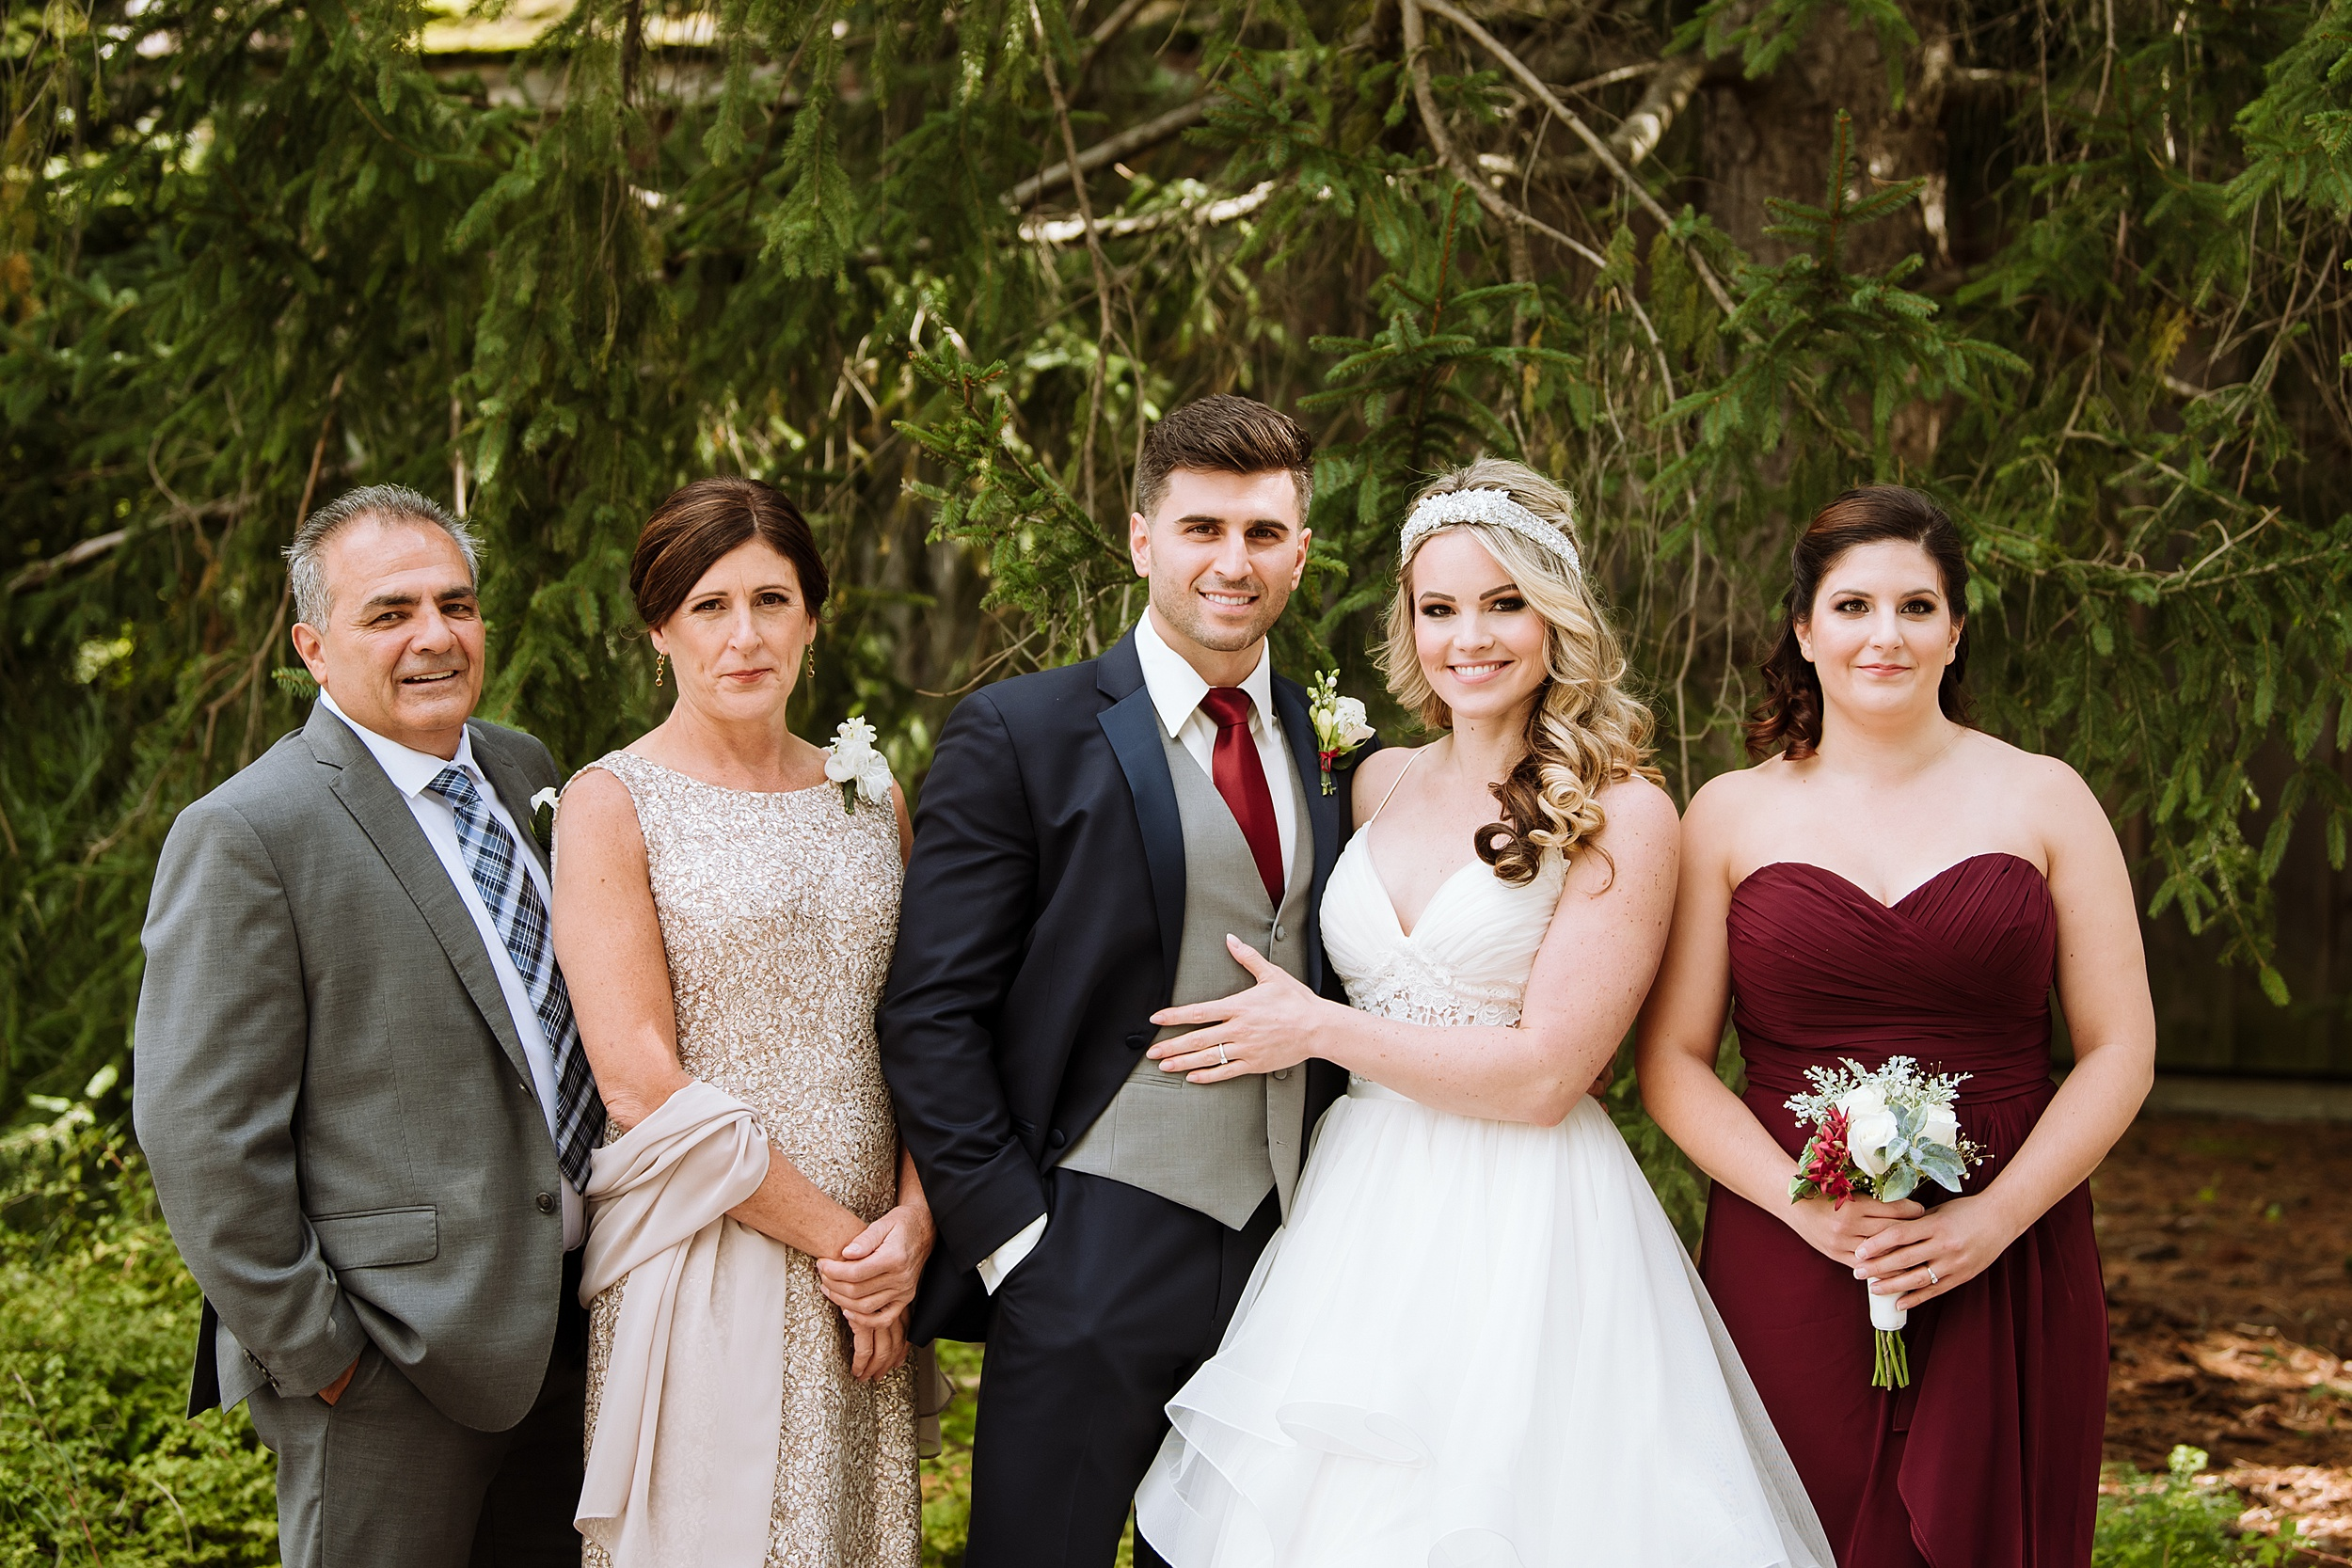 McMichael_Art_Collection_Wedding_chateau_le_jardin_Justine_Munro_Toronto_Photographer038.jpg